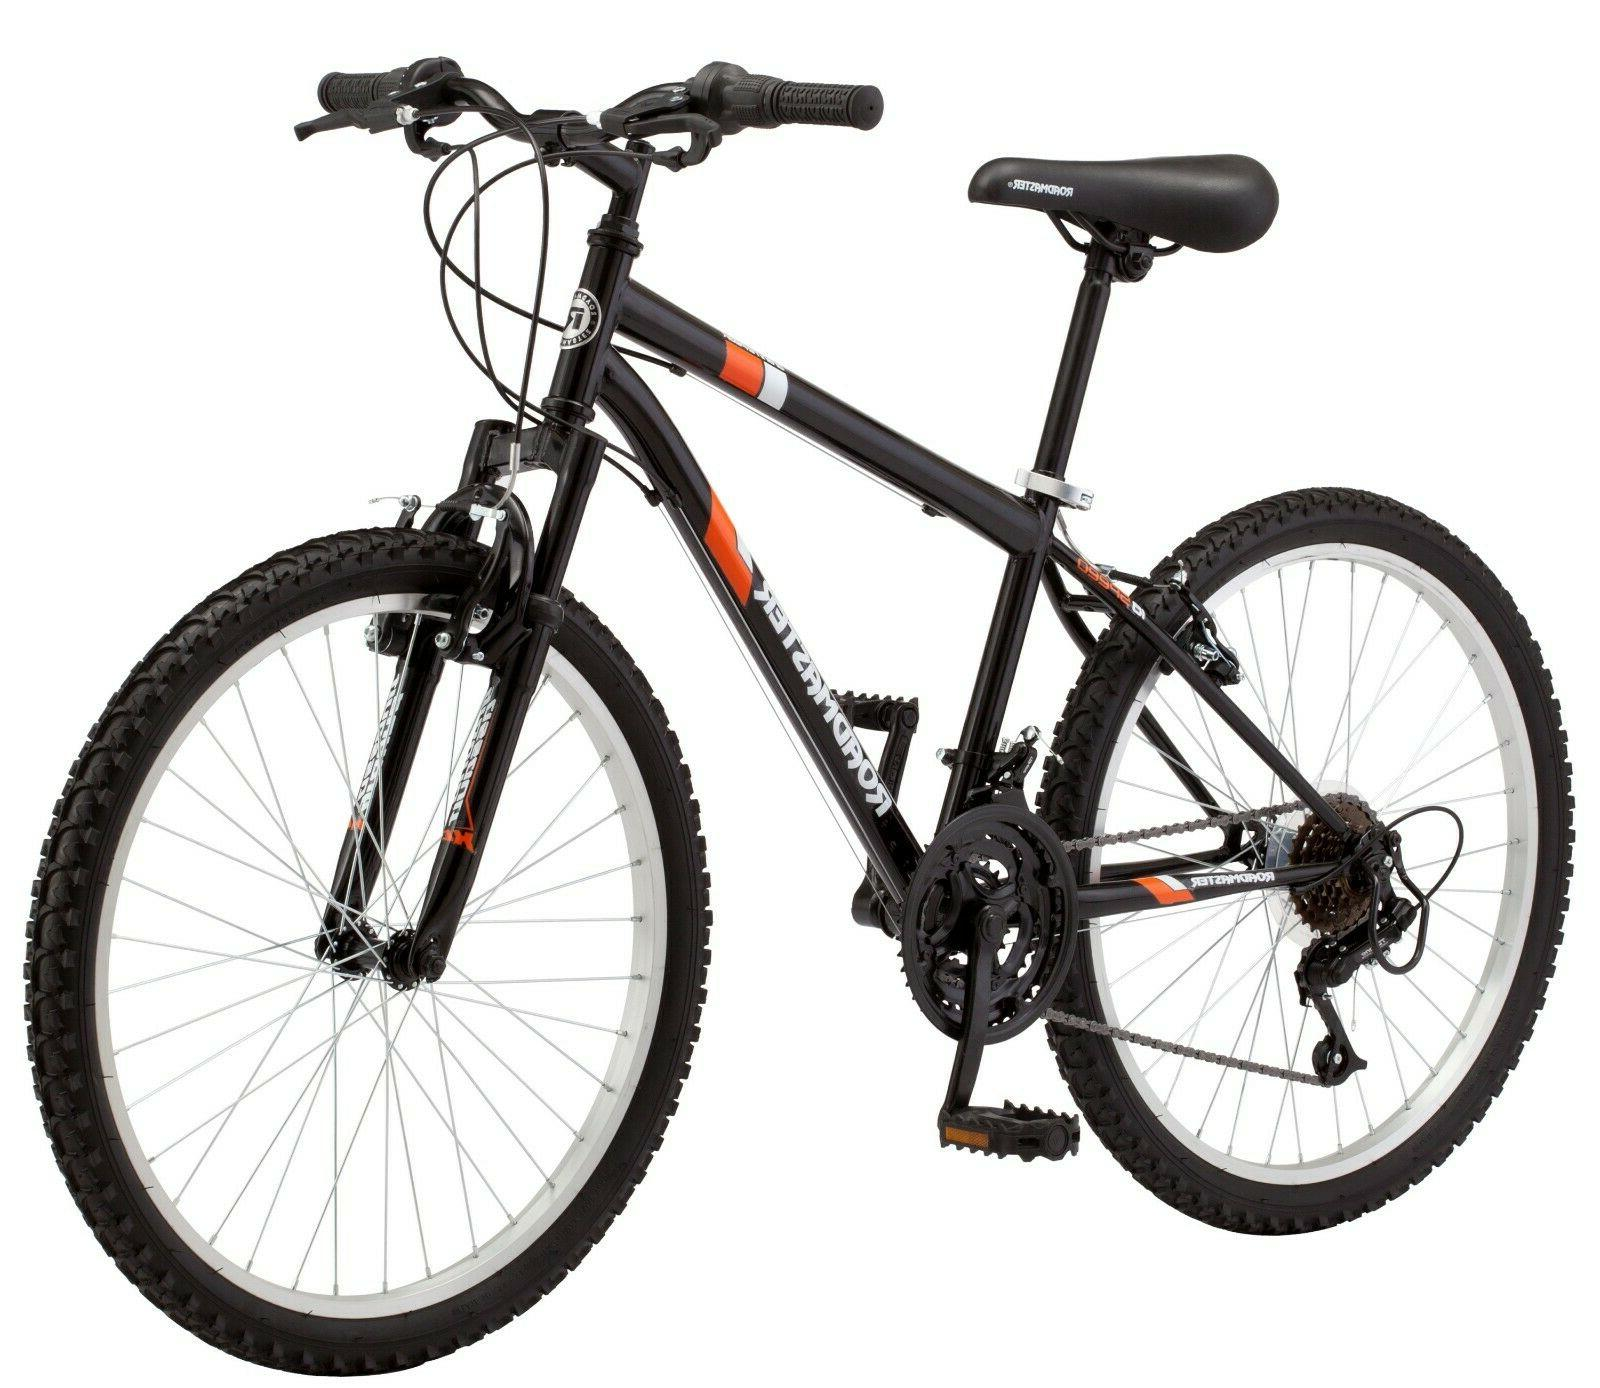 "Mountain Bike Roadmaster Granite Peak Boy's Bicycle 24"" whee"